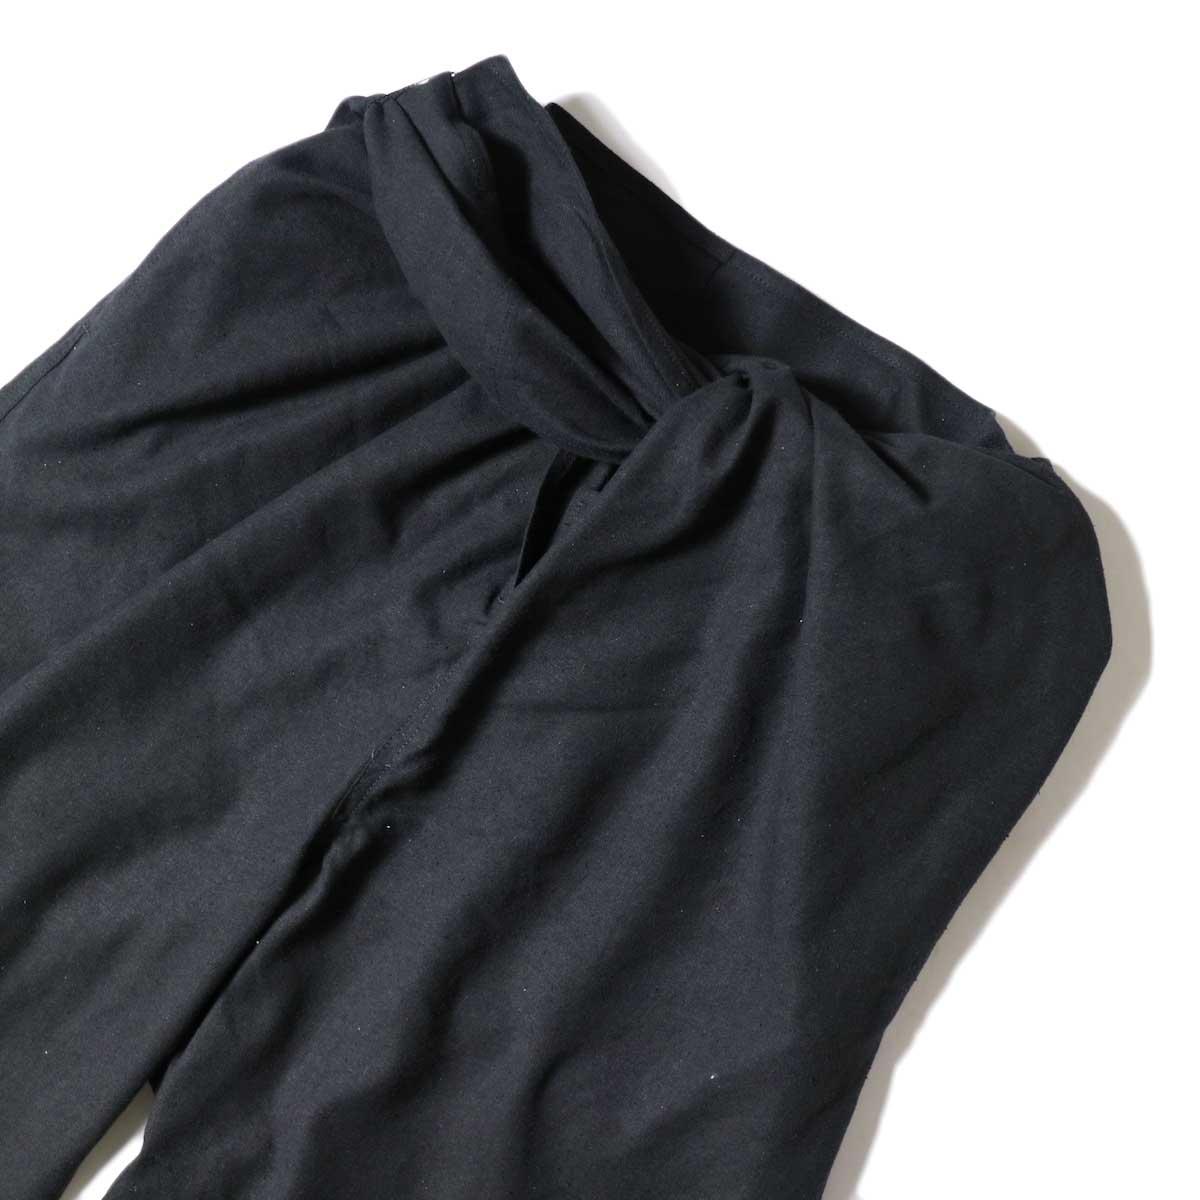 ARCHI / S/L NEP WRAP SLACKS (Black) ウエスト絞り